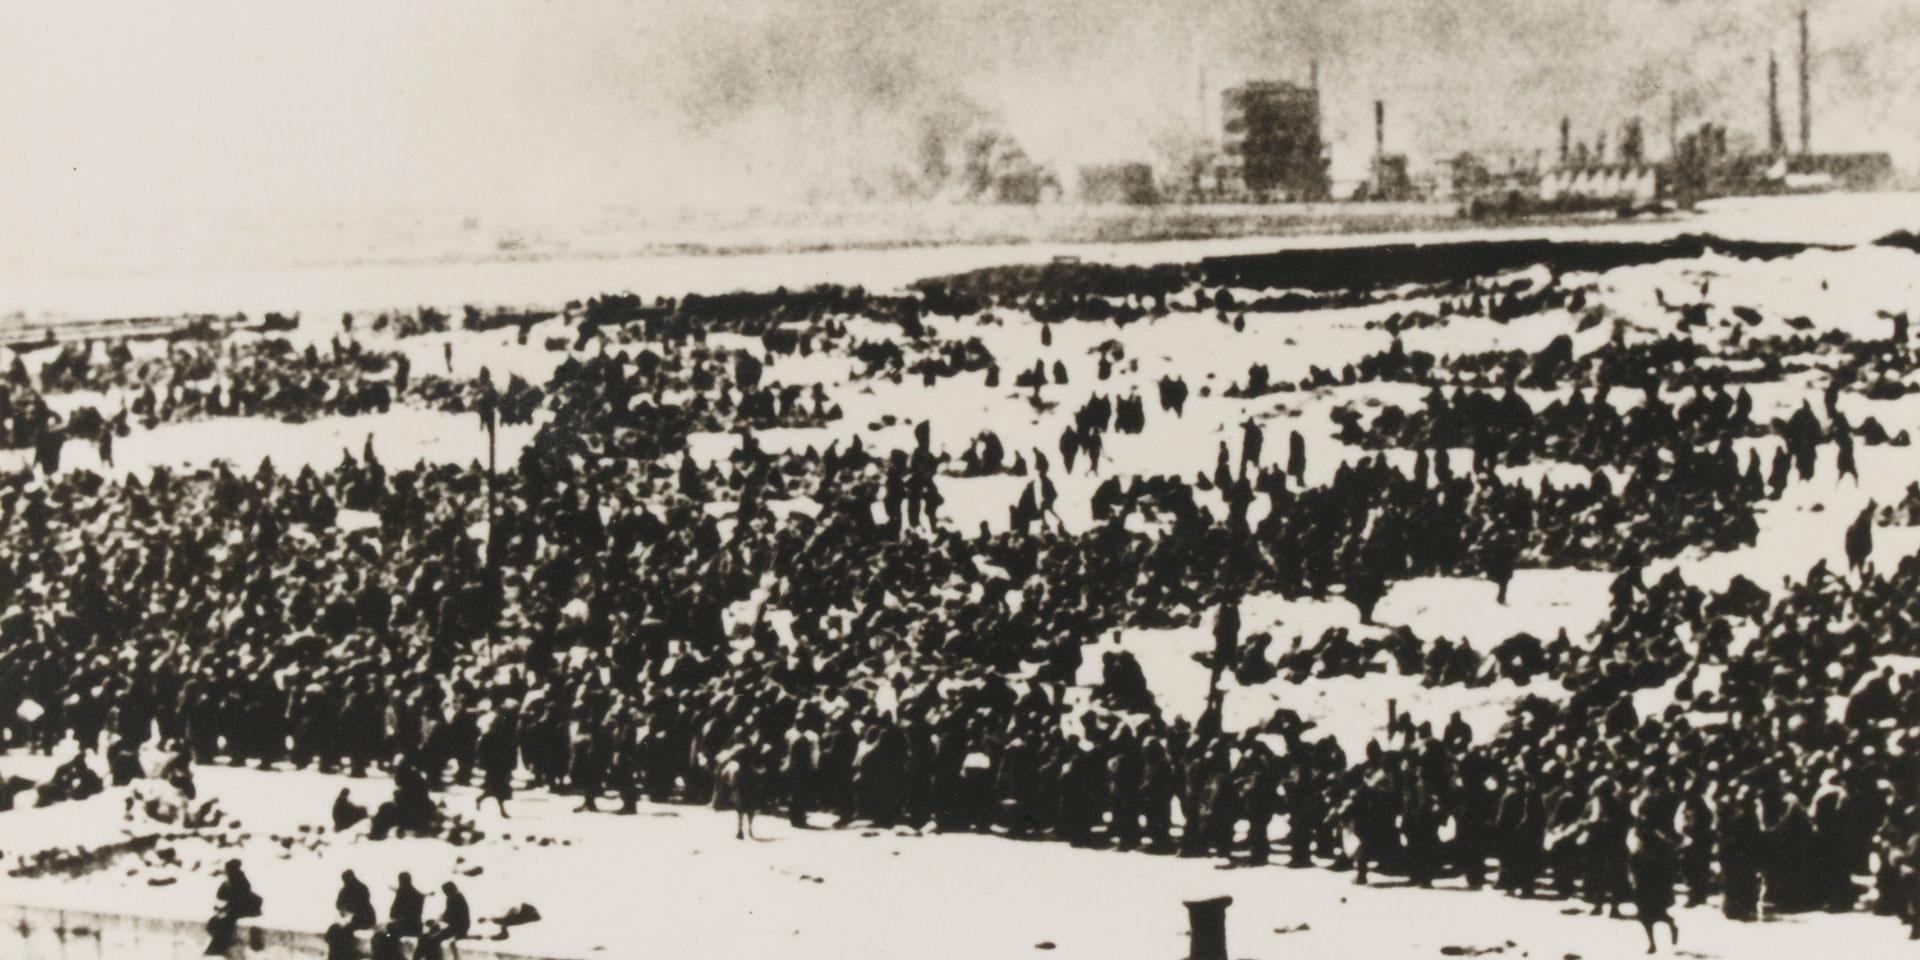 Awaiting evacuation, Dunkirk, 1940